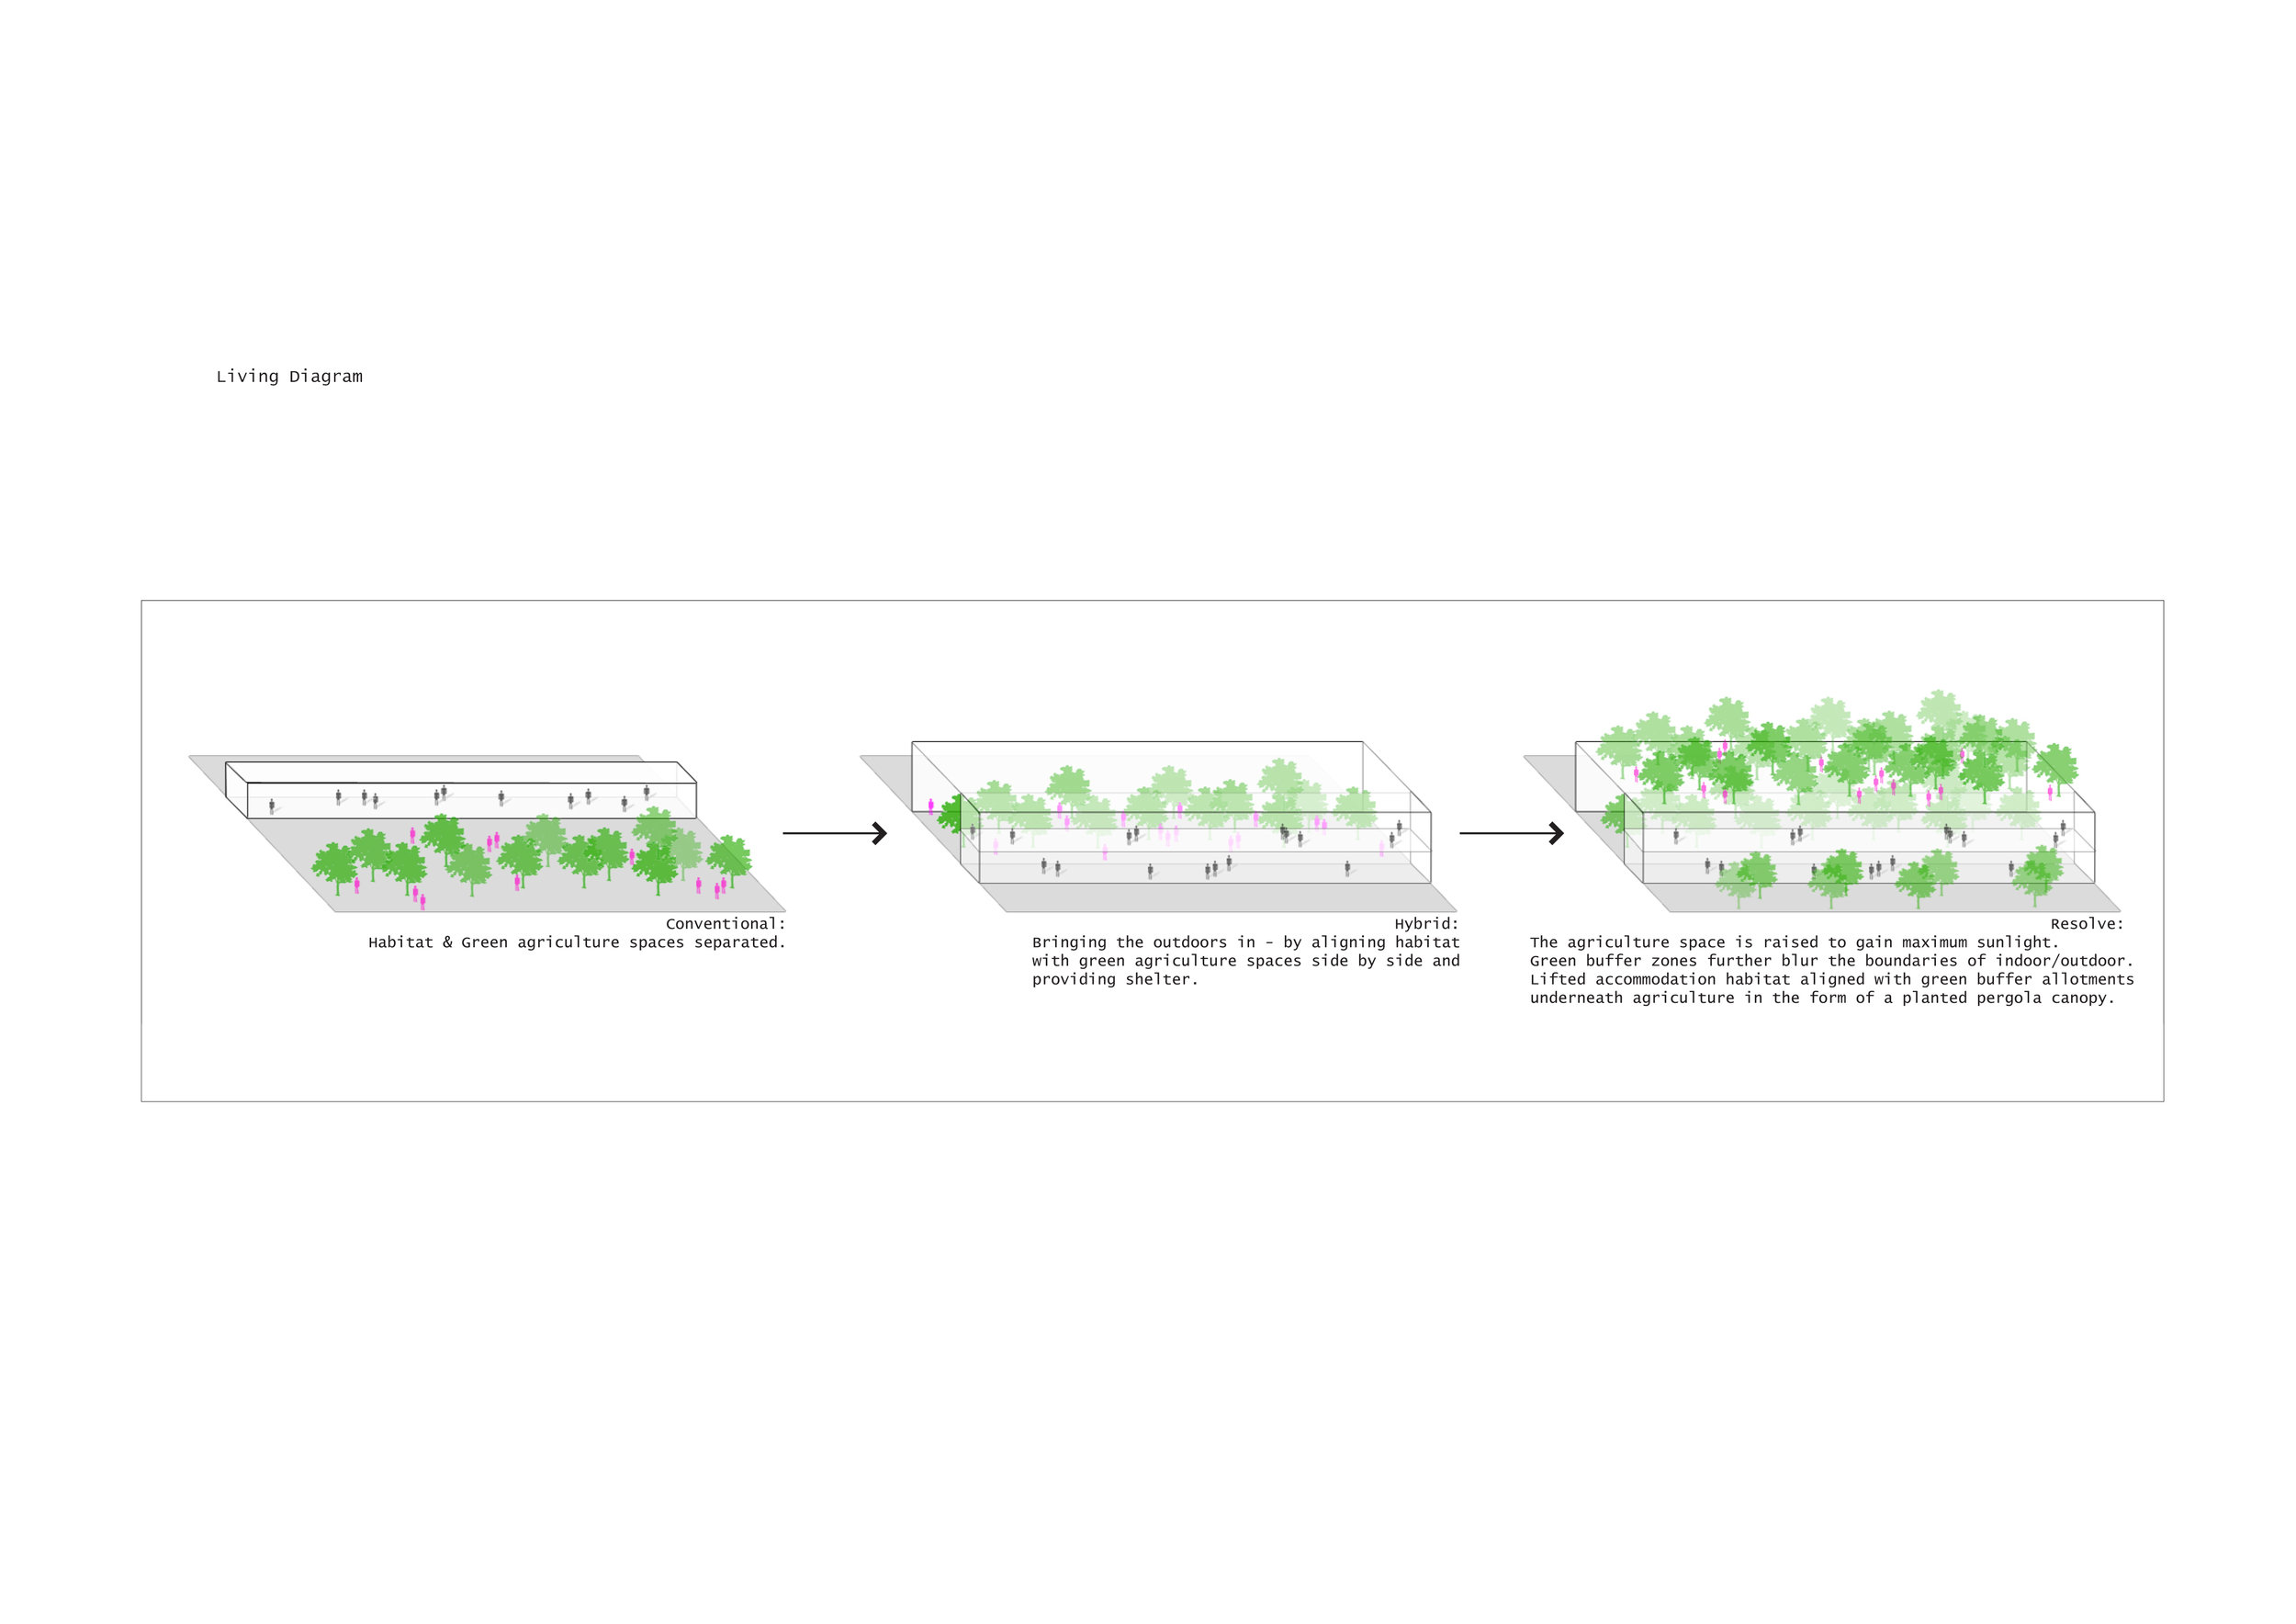 Diagram06_Concept_Living.jpg